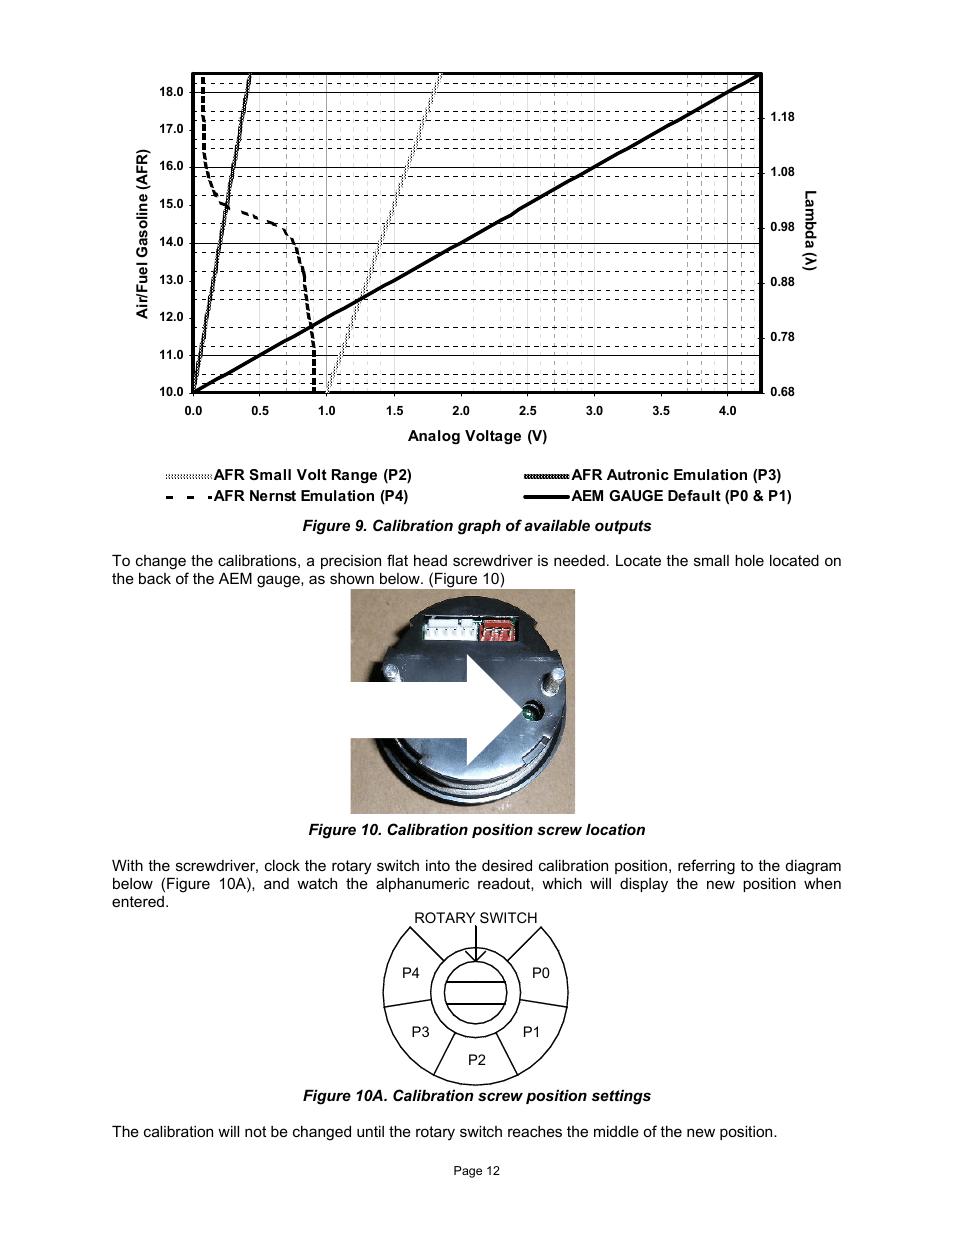 hight resolution of  o2 aem uego wideband wiring diagram aem 30 4110 digital wideband uego gauge user manual page 12 14 on